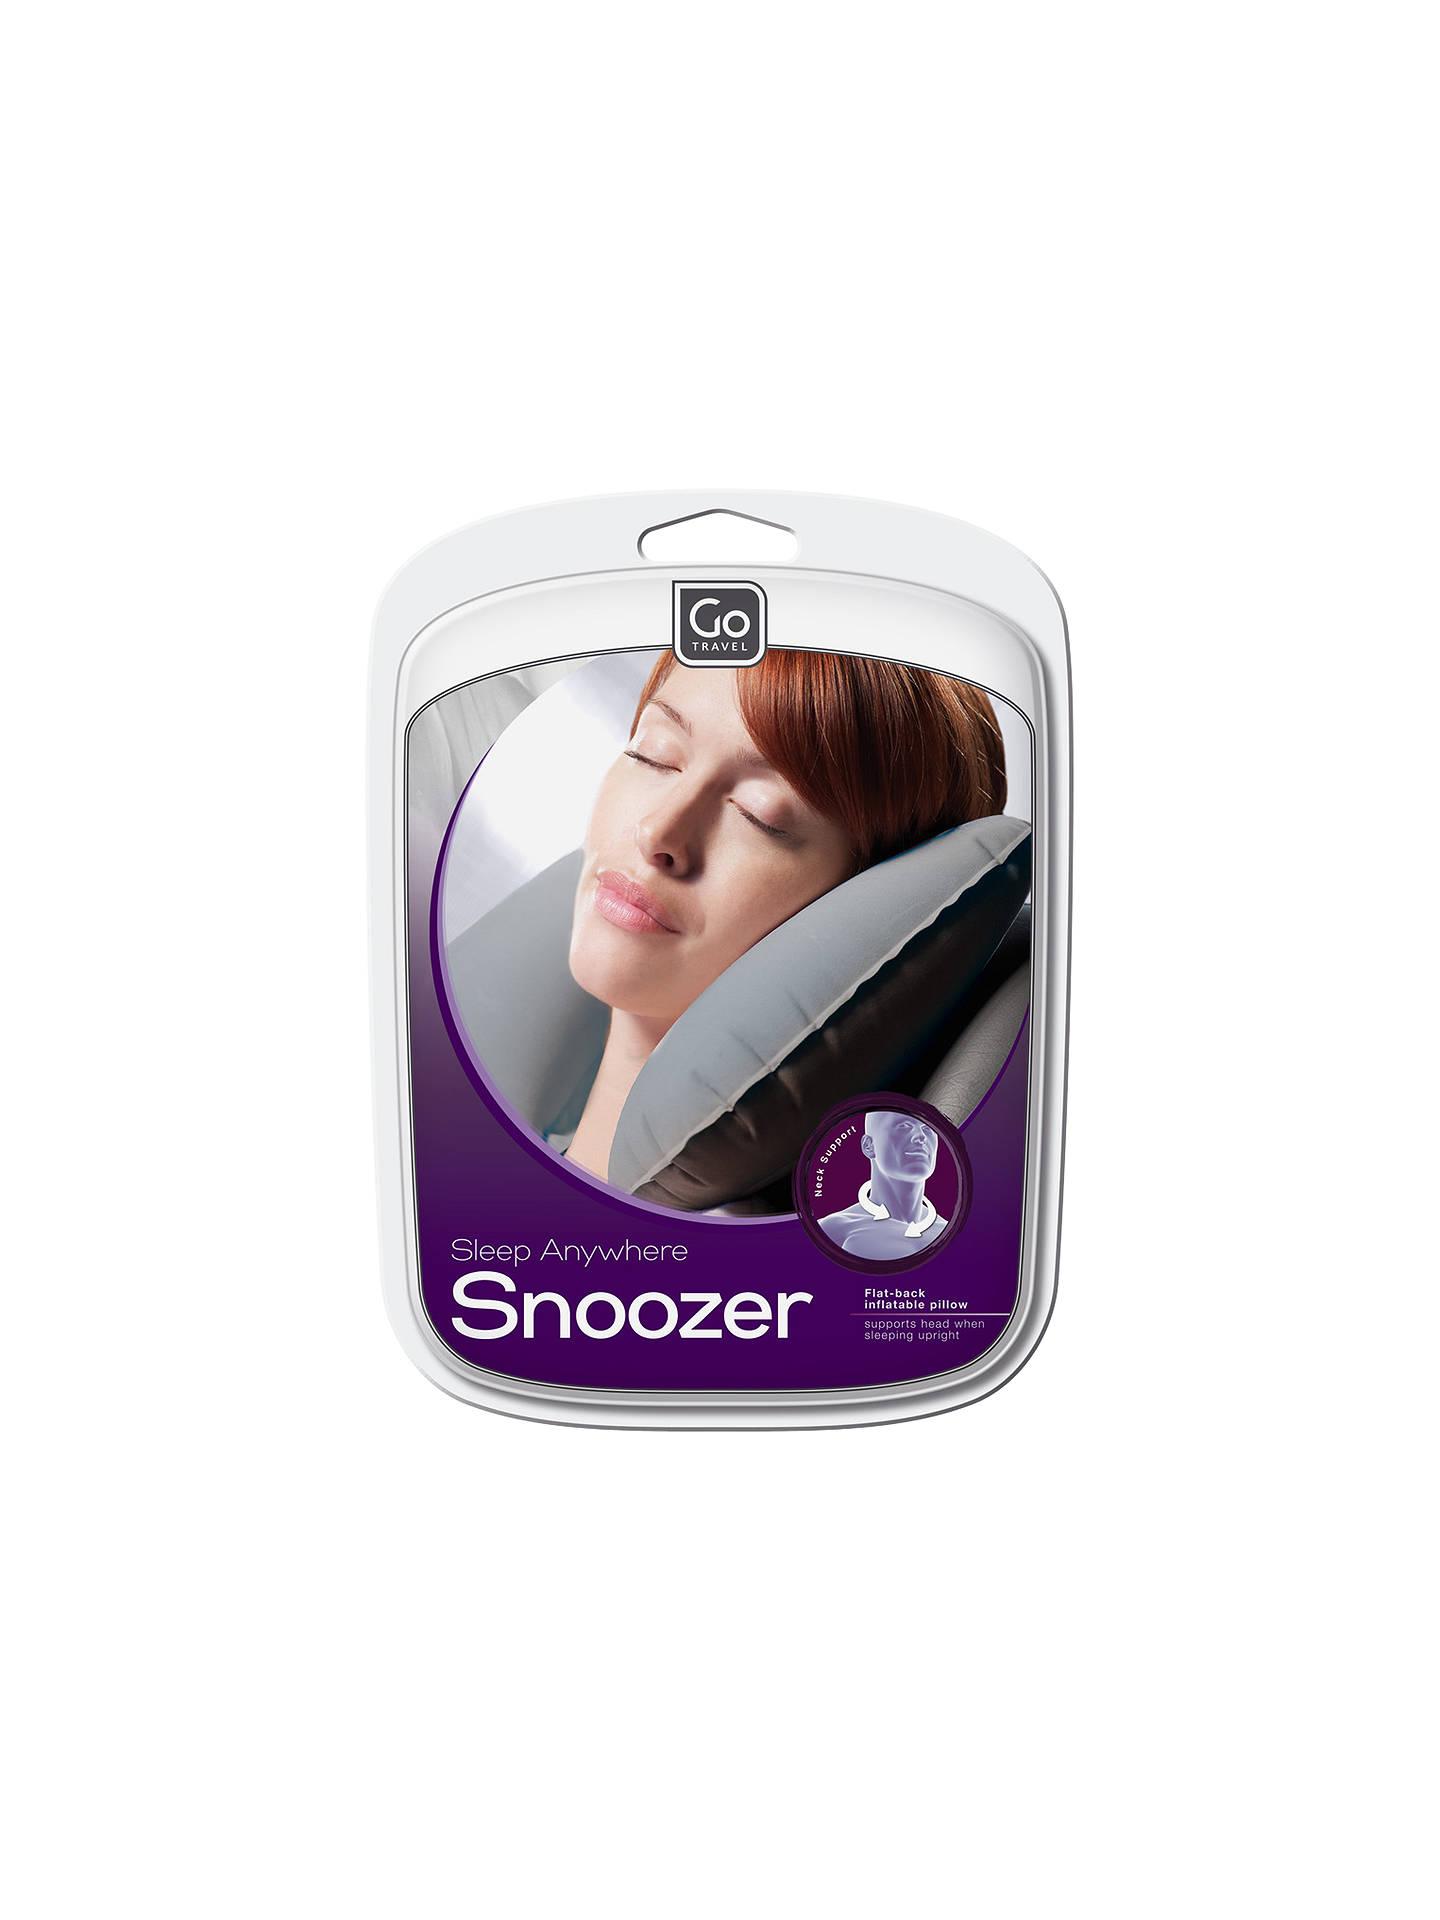 Go Travel Snoozer Travel Pillow at John